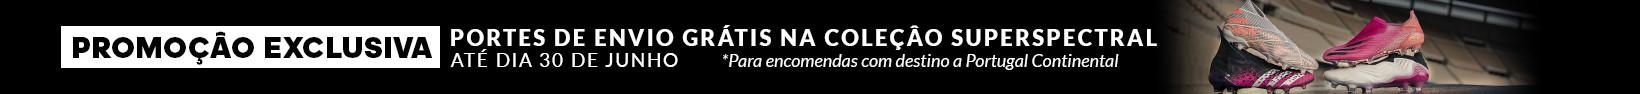 adidas_superspextral_envios_barrita_PT.jpg